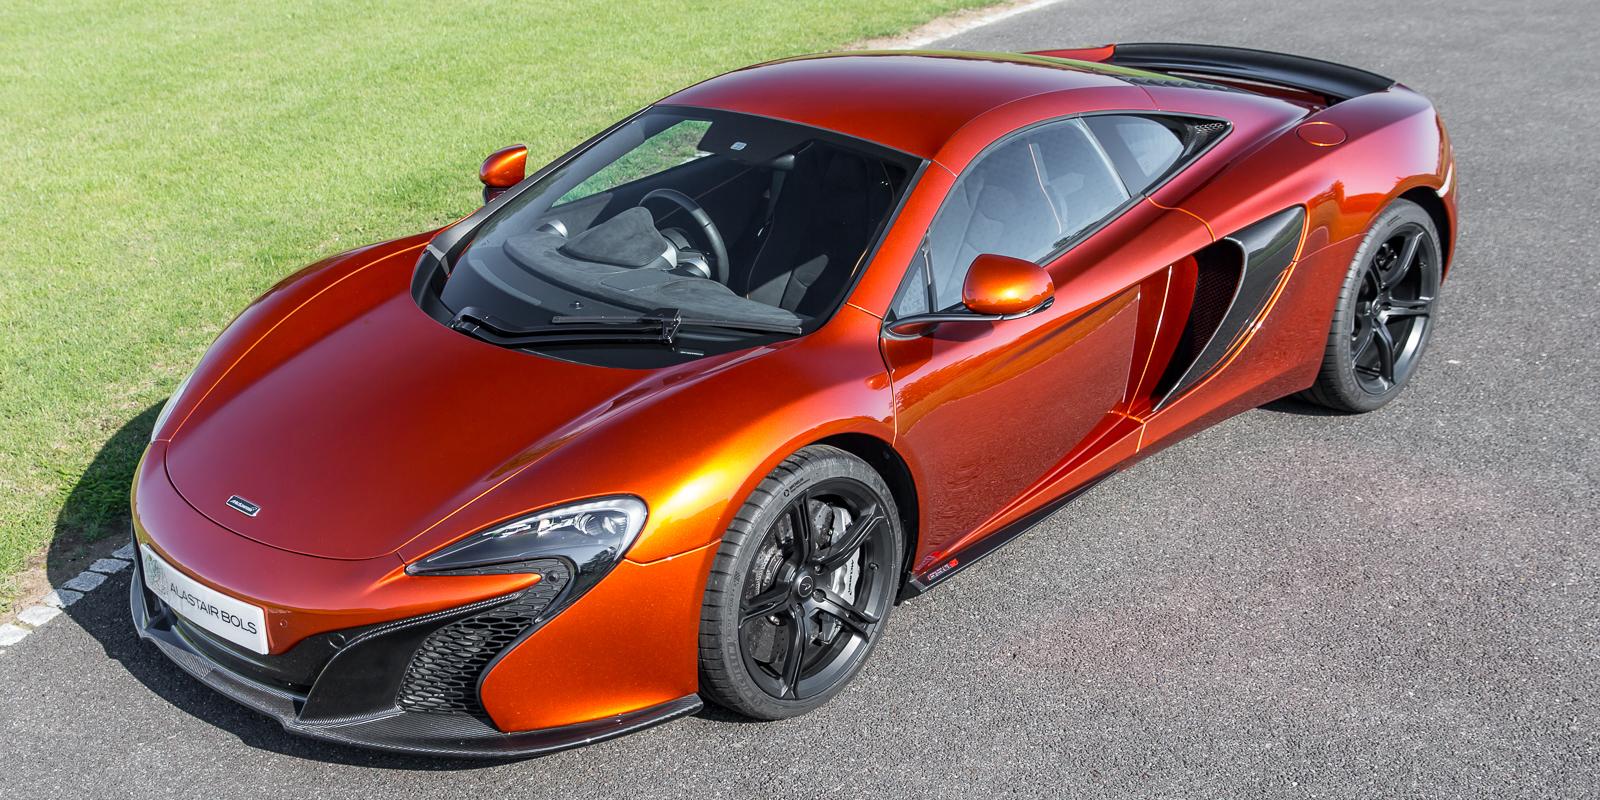 McLaren 650S Coupe – Volcano Orange